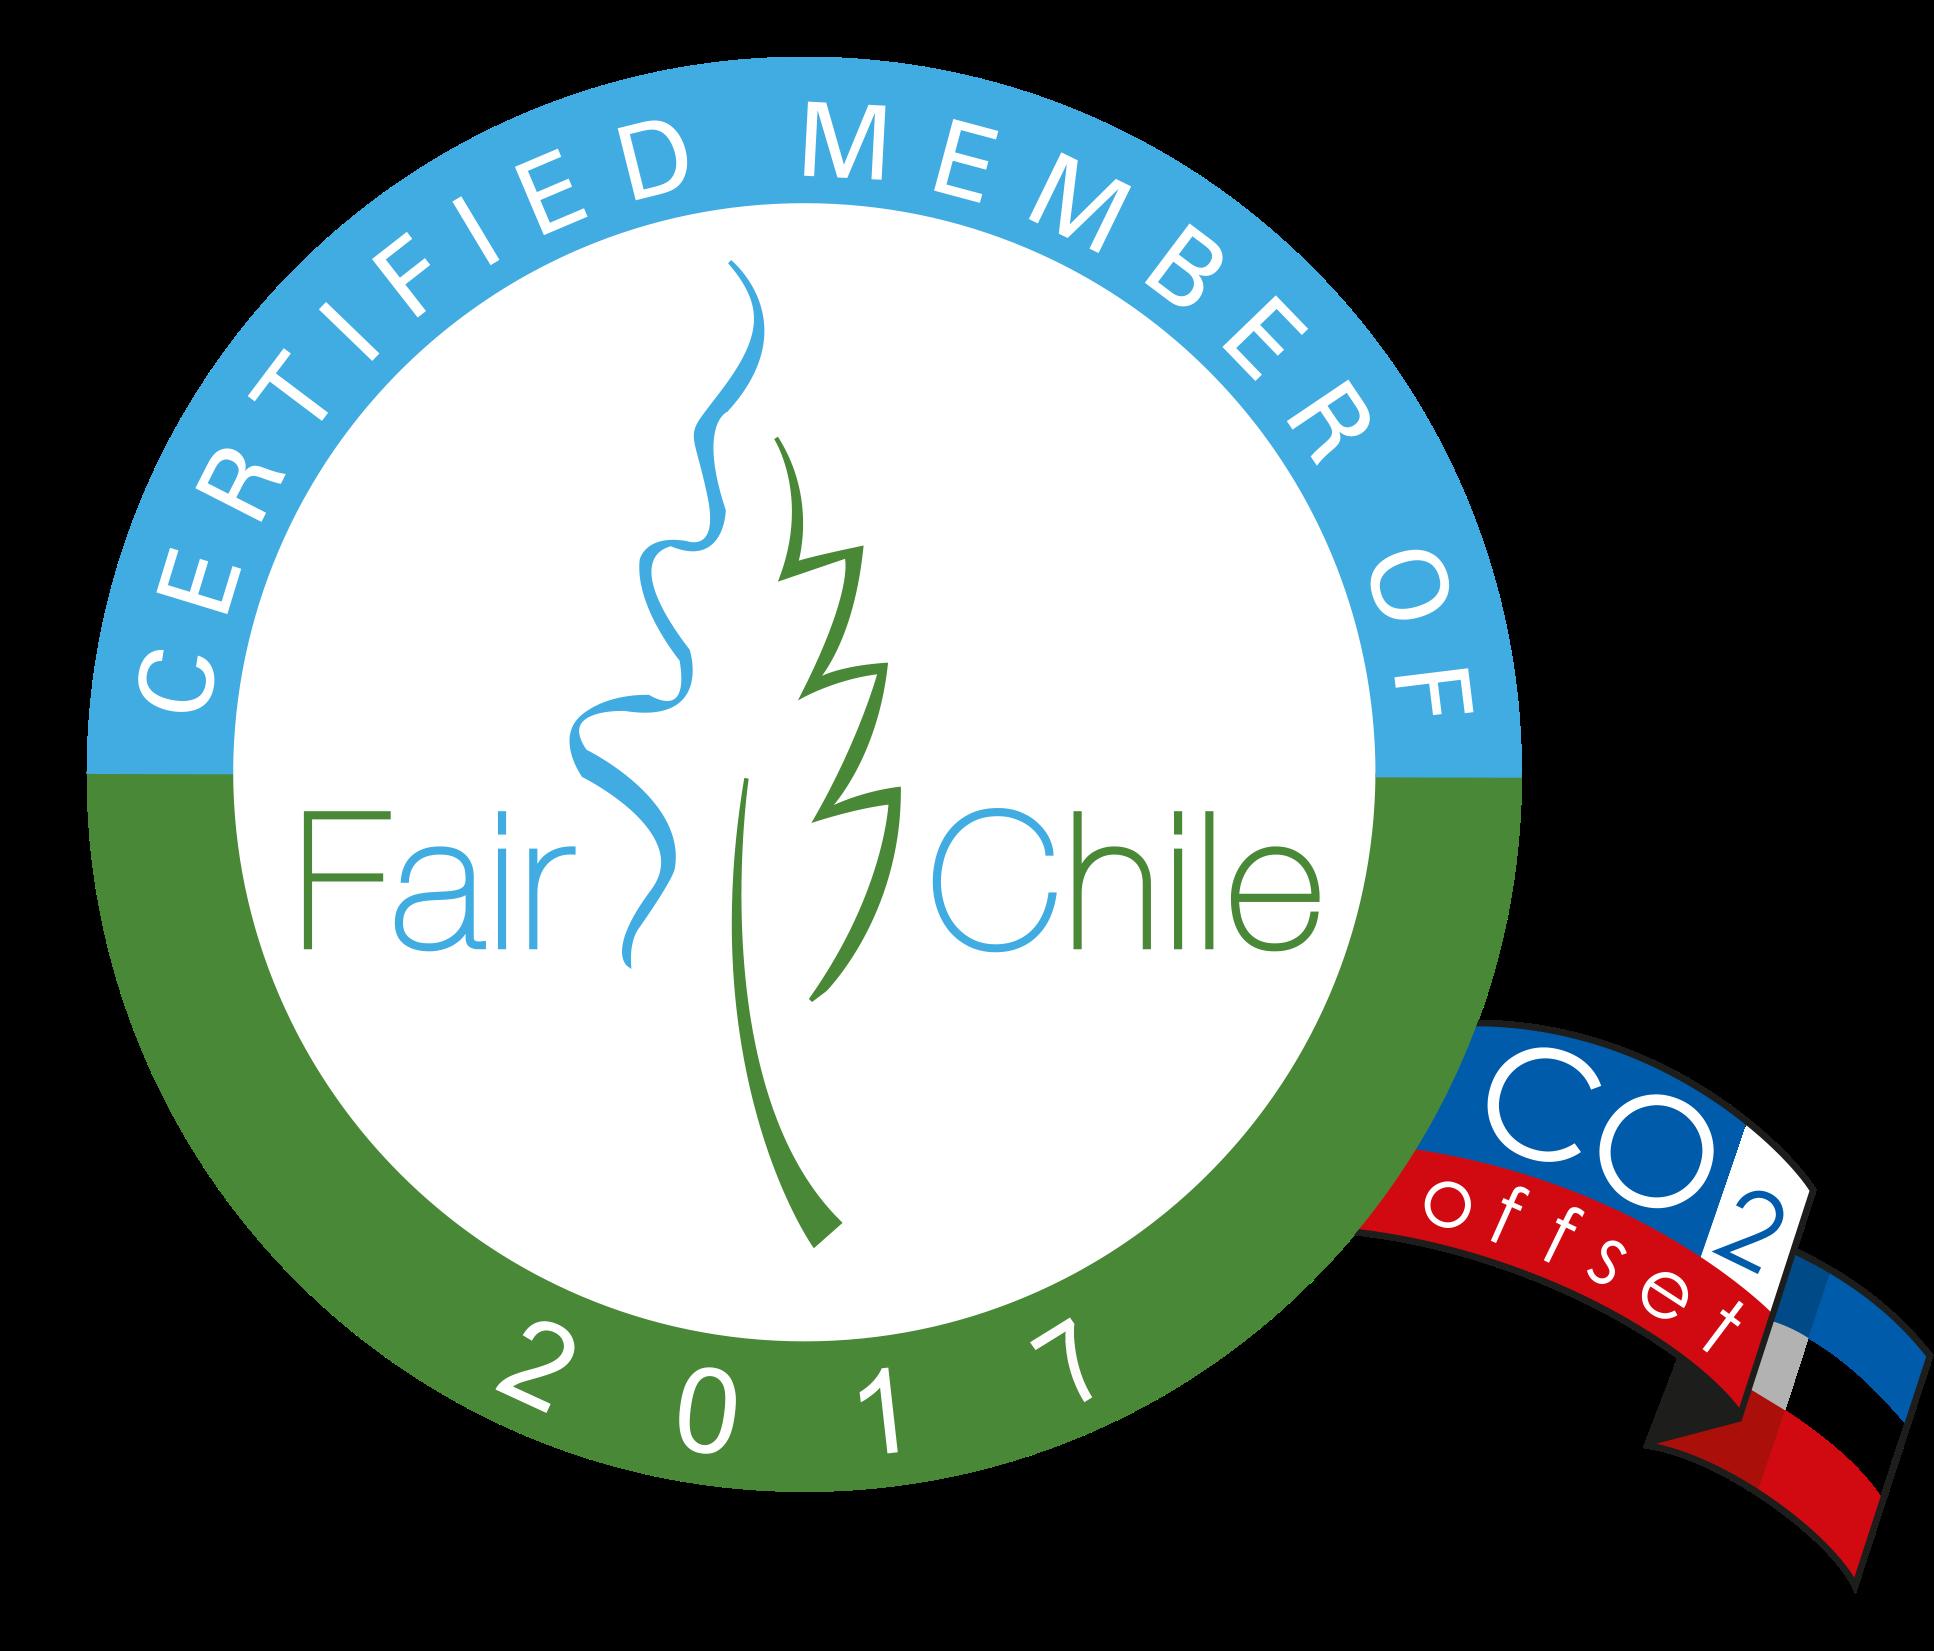 Trekking FairChile Certificate